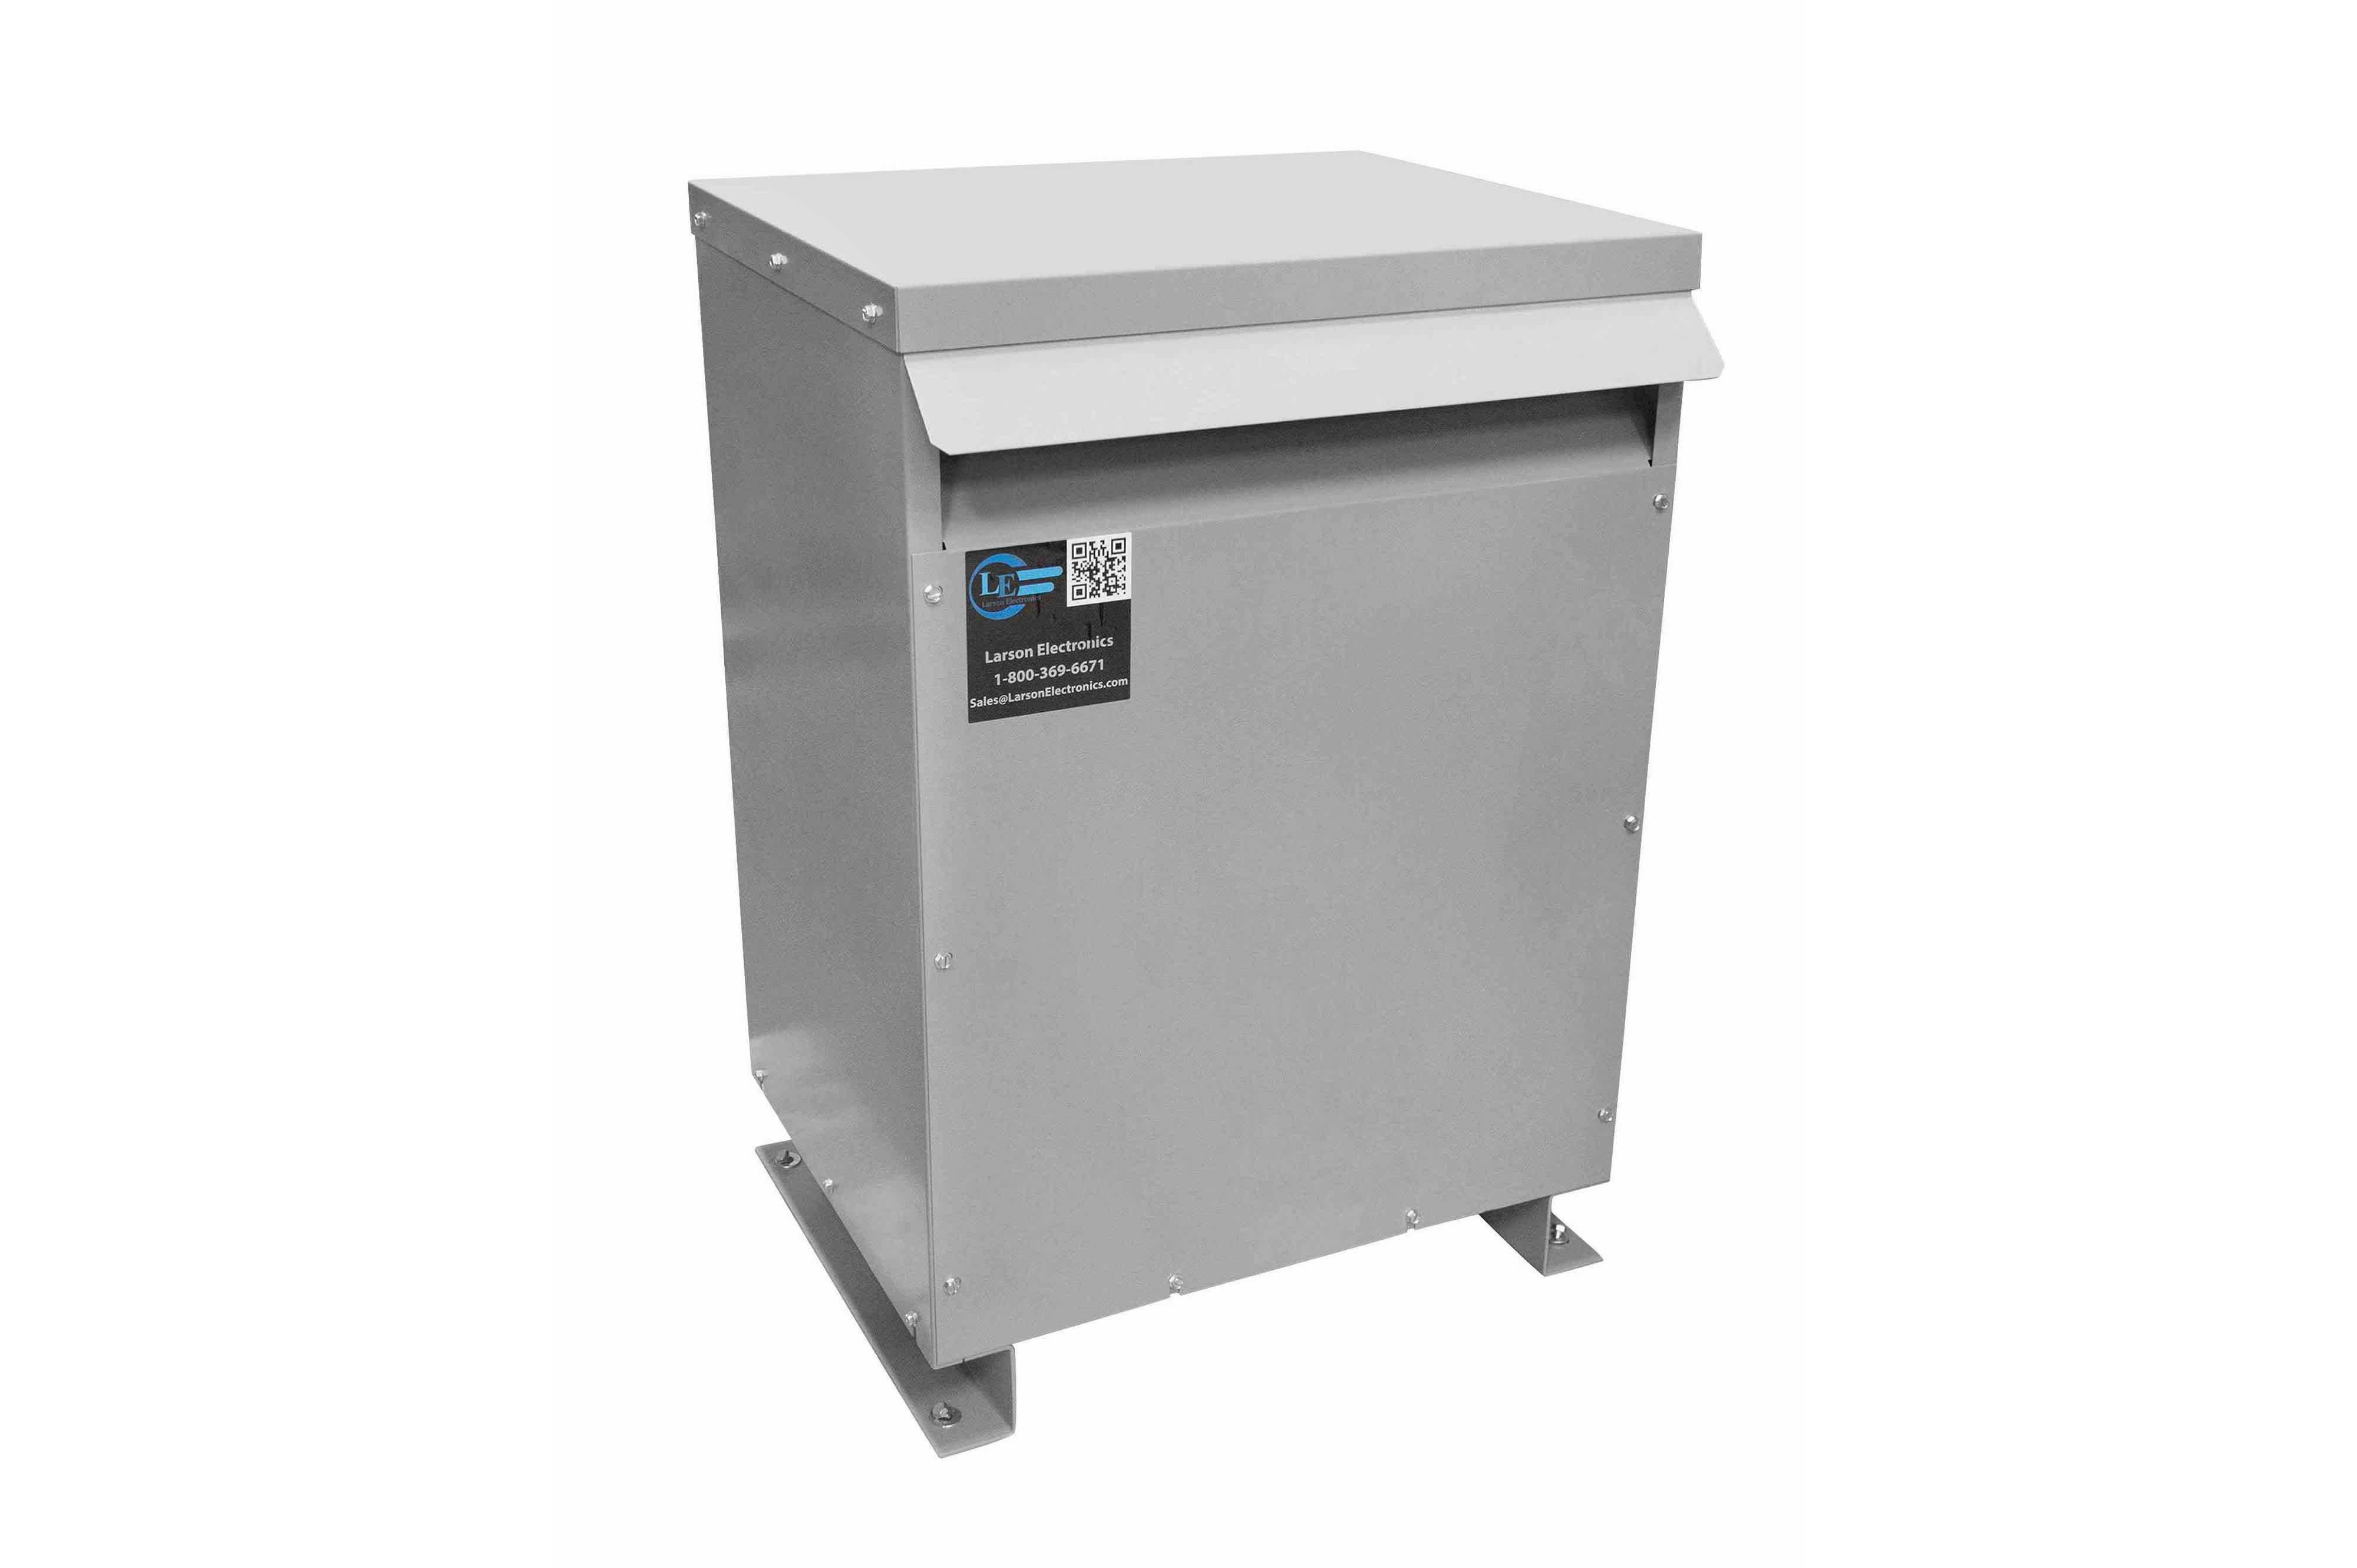 800 kVA 3PH Isolation Transformer, 575V Wye Primary, 240V/120 Delta Secondary, N3R, Ventilated, 60 Hz